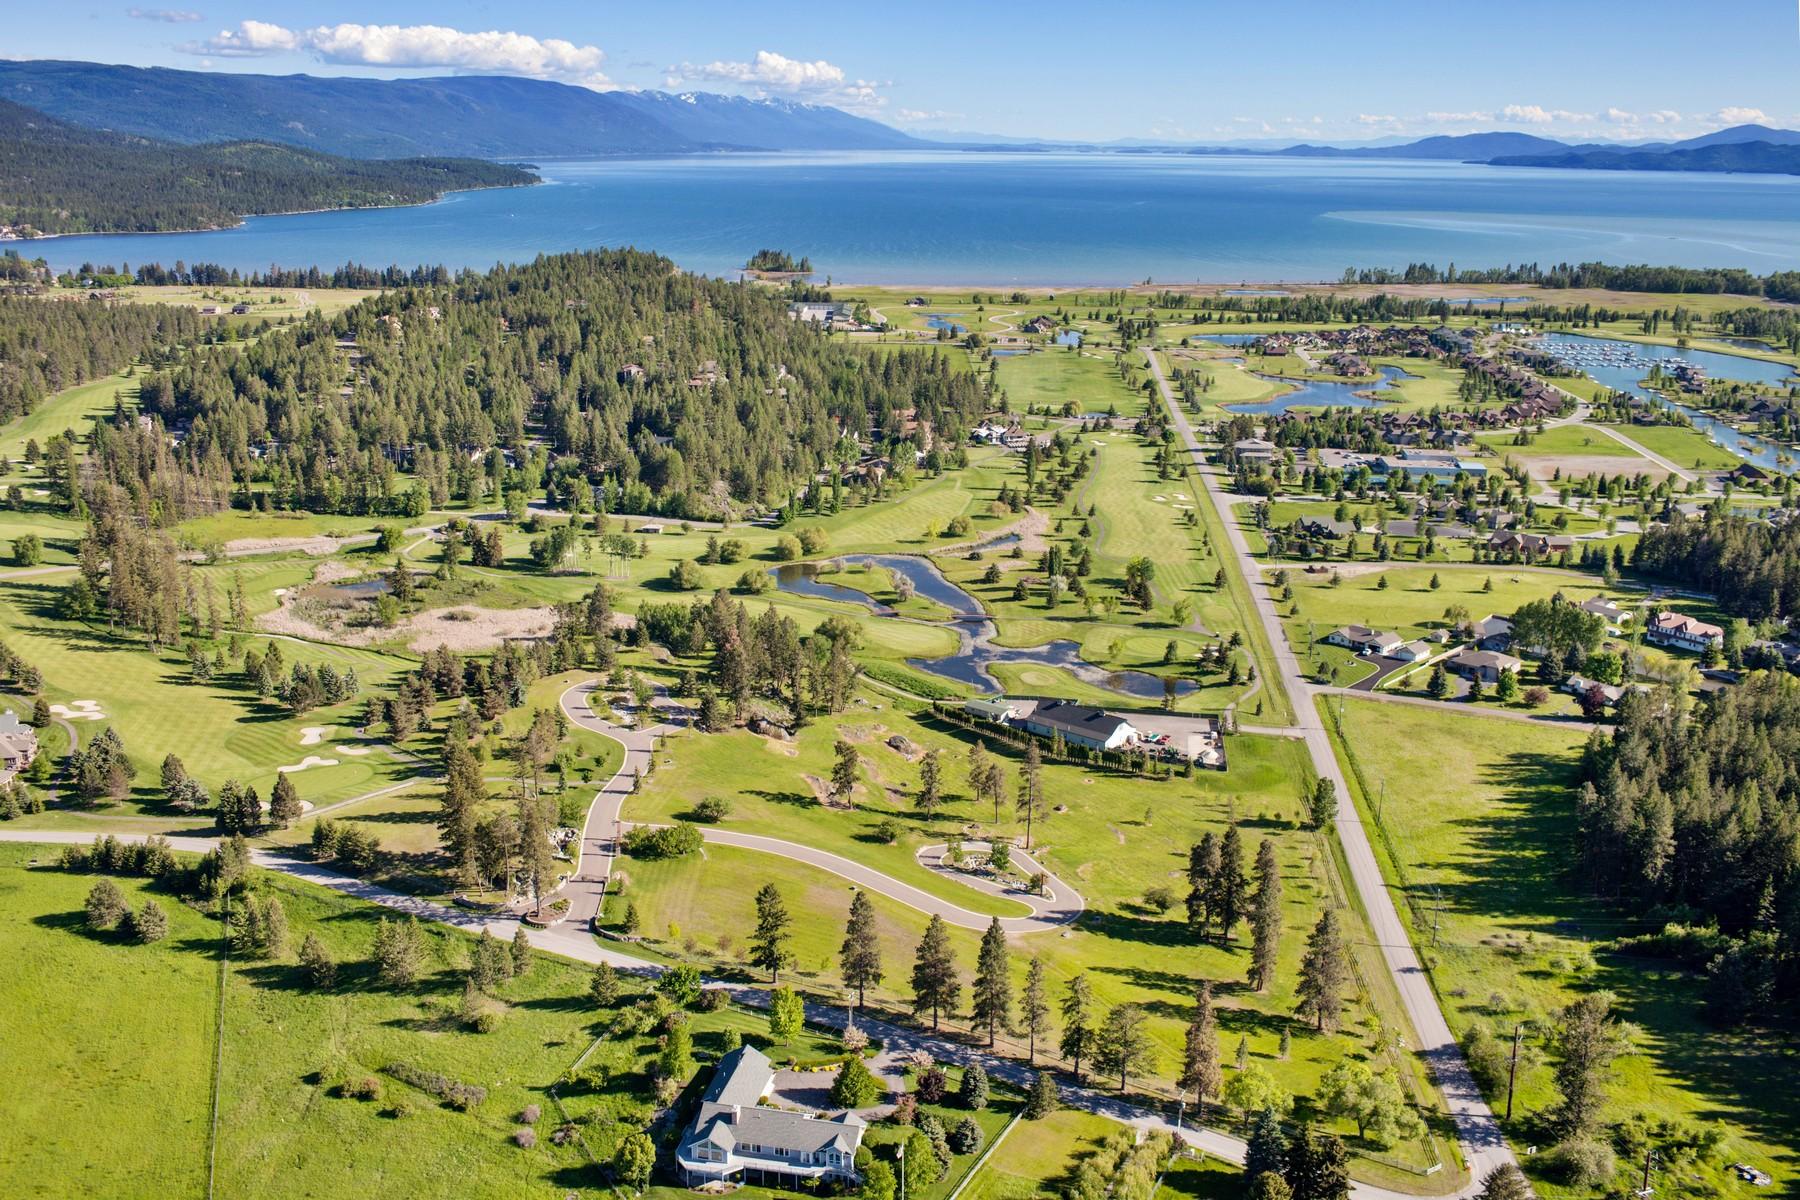 Terreno por un Venta en Eagle Rock 1125 Holt Drive Bigfork, Montana 59911 Estados Unidos